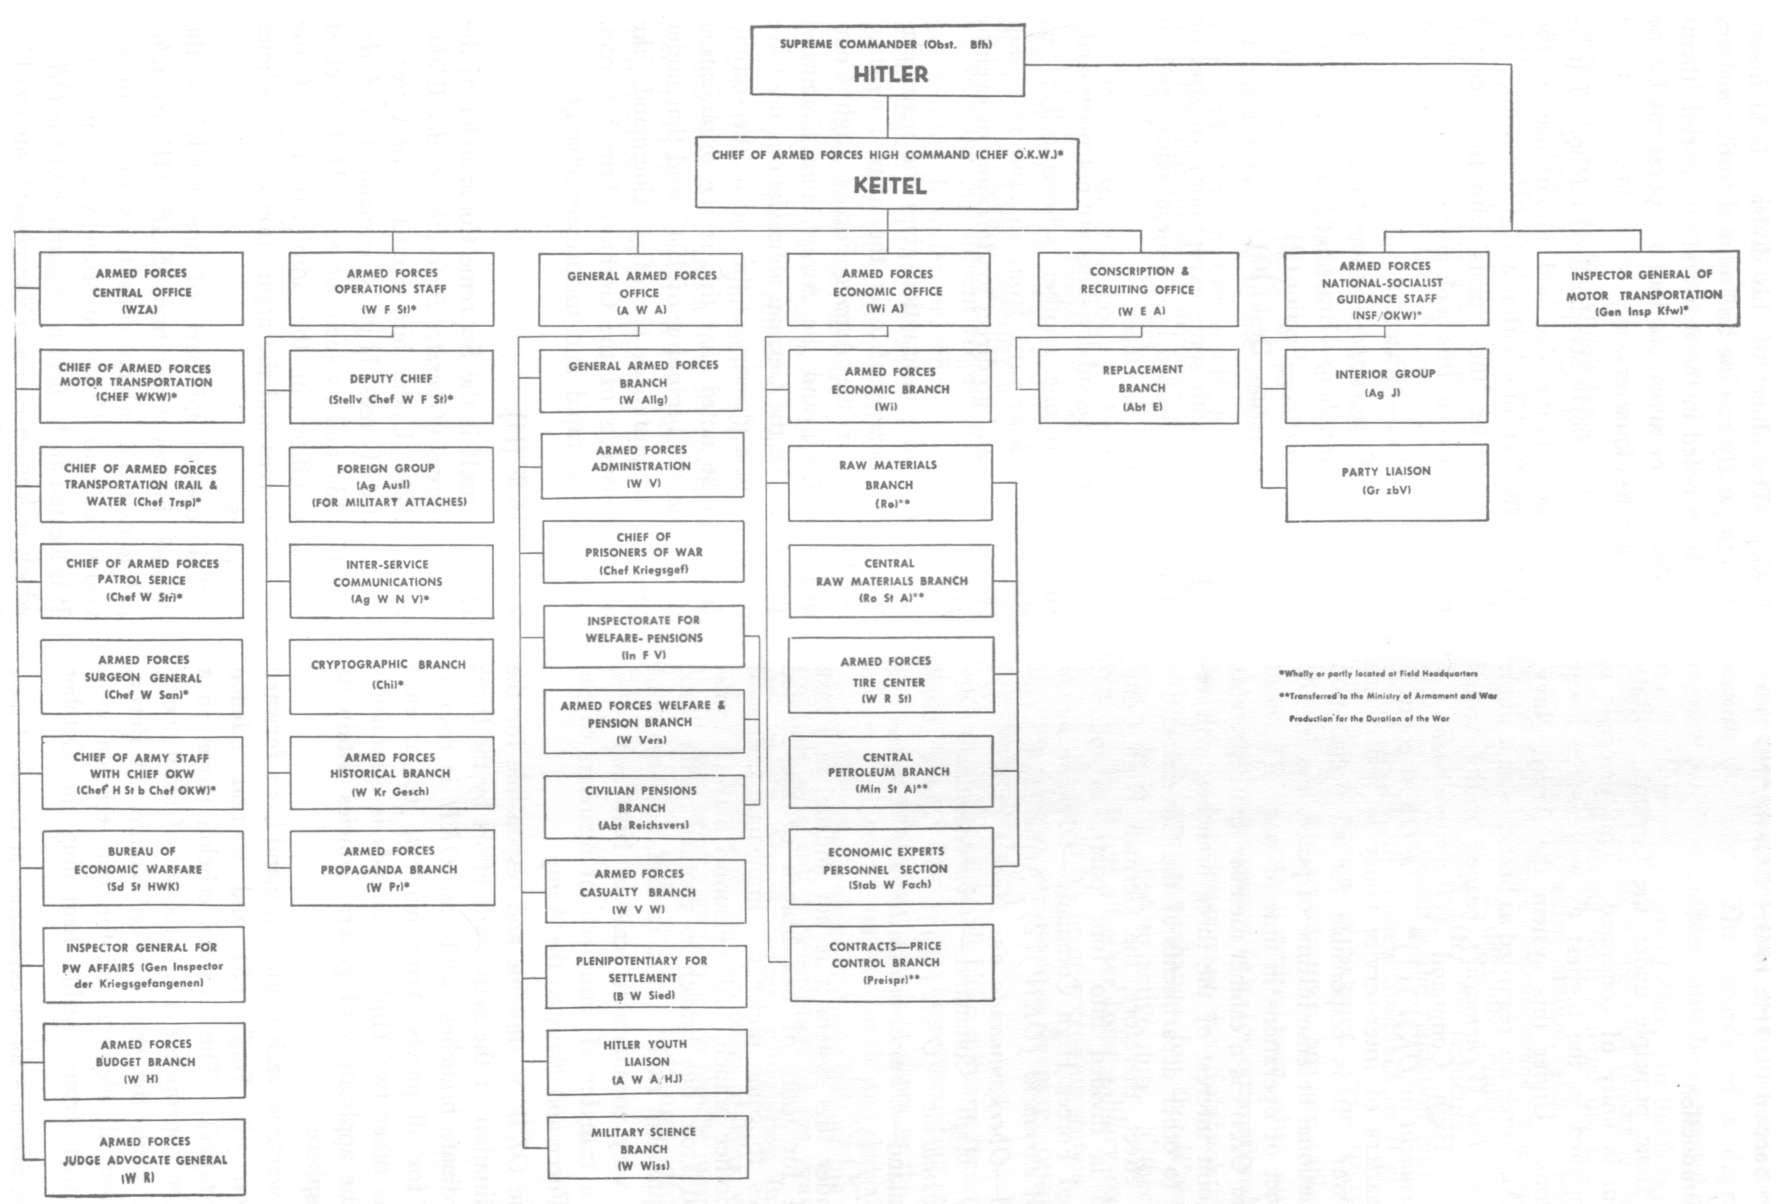 HyperWar: Handbook on German Military Forces (Chapter 1)